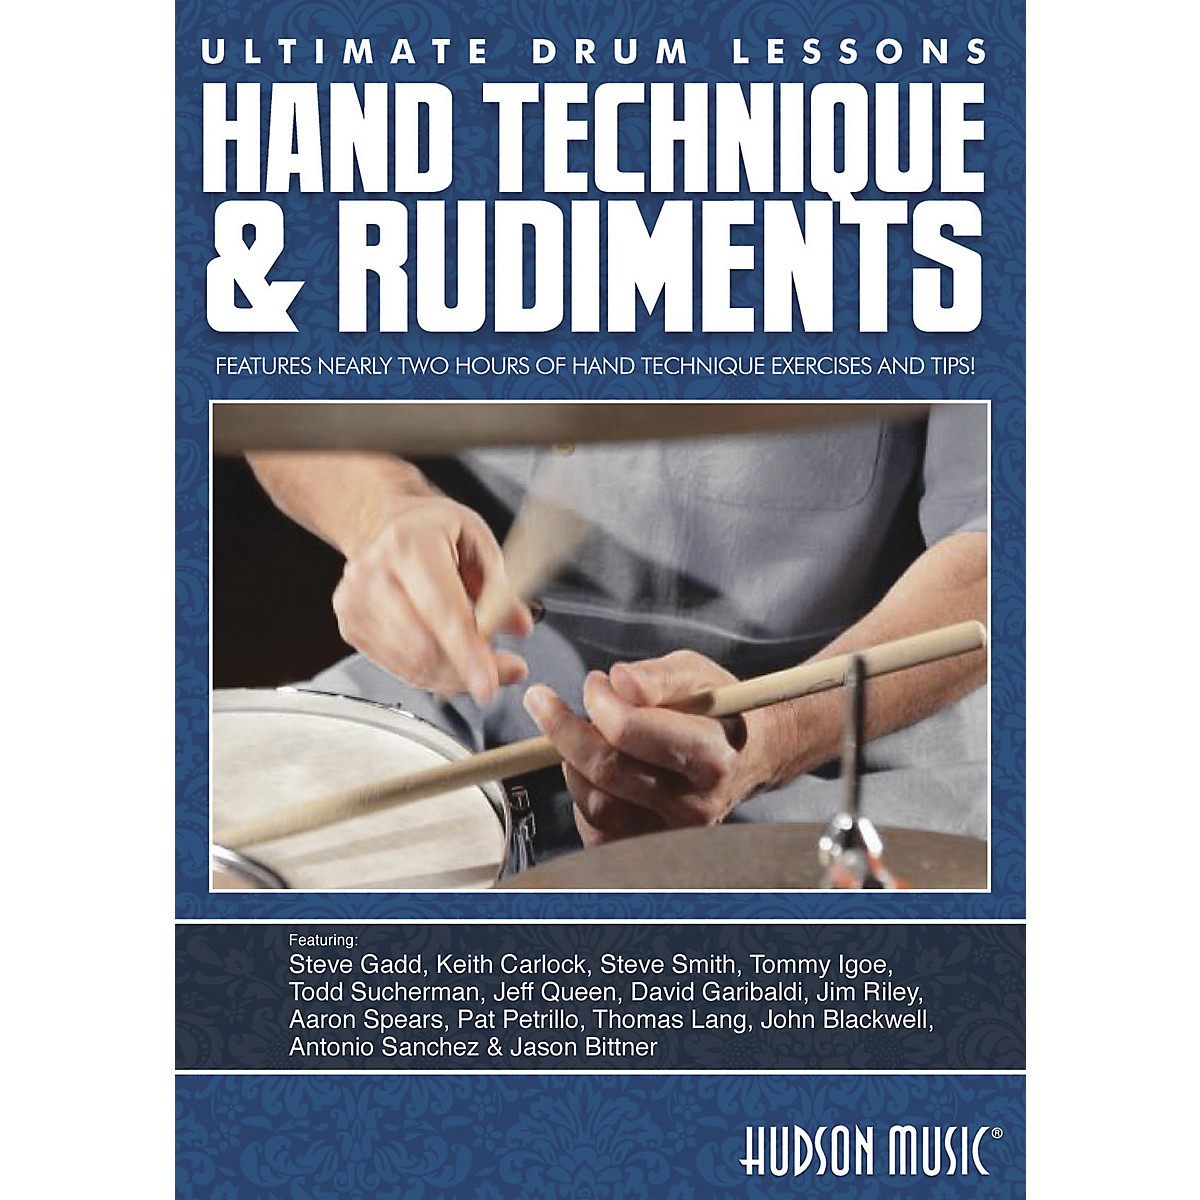 Hudson Music Hand Technique & Rudiments- Ultimate Drum Lessons Series DVD